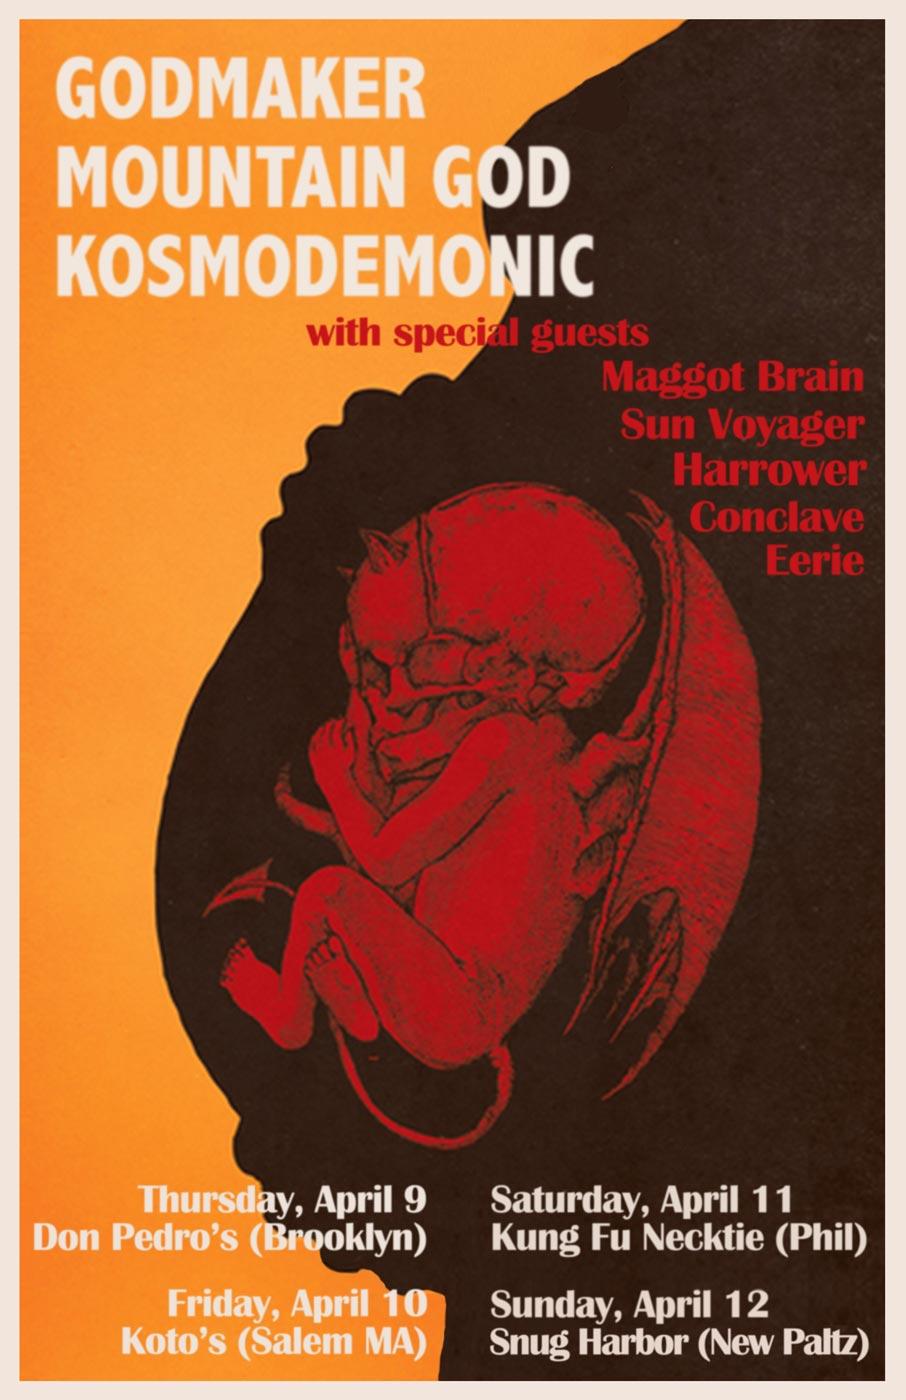 godmaker-mountain-god-kosmodemonic-tour-poster